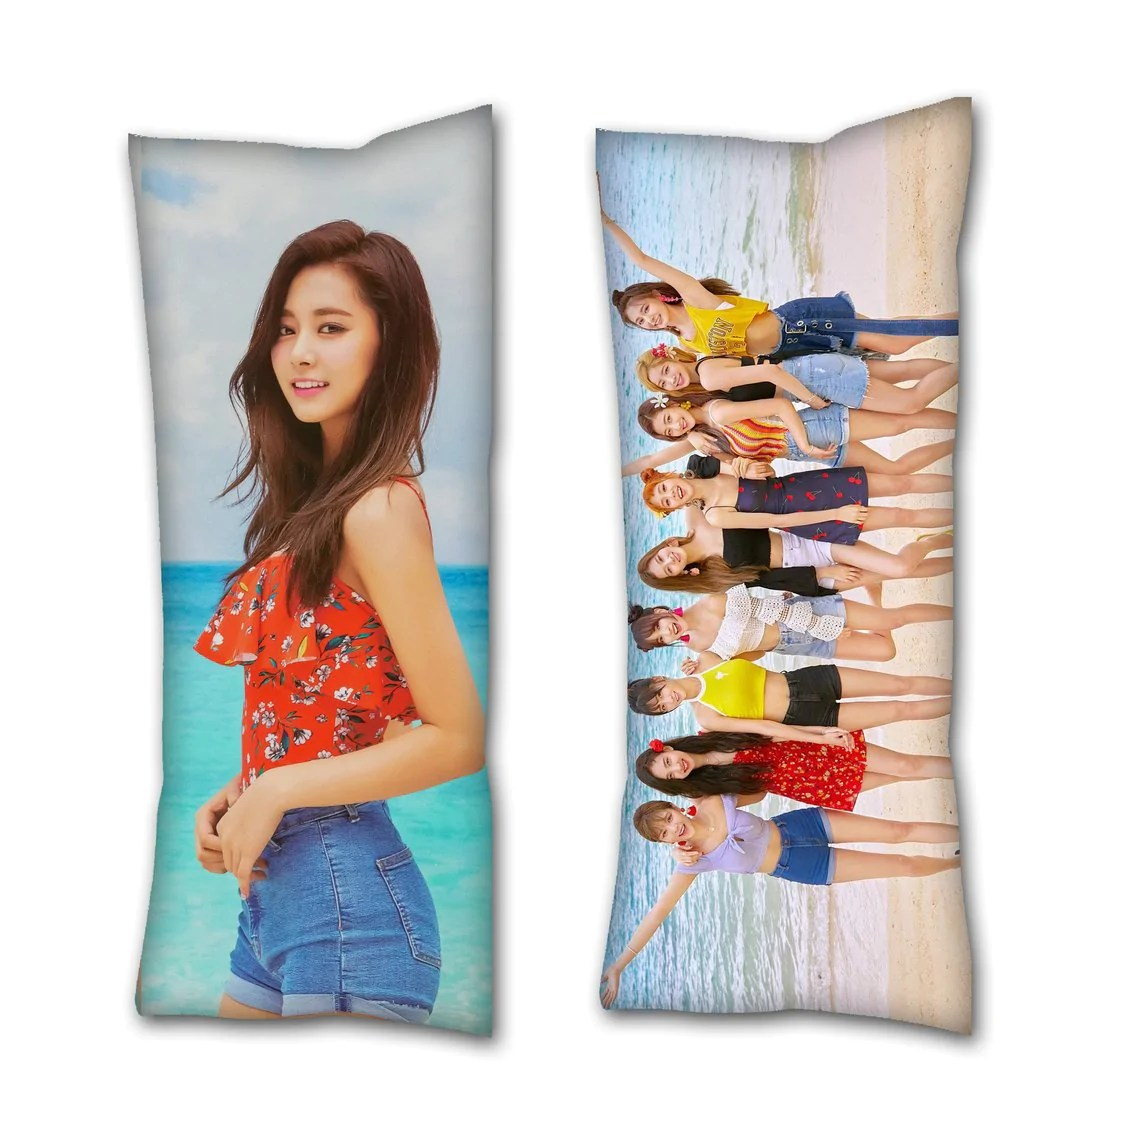 kpop ftw exclusive kpop body pillows